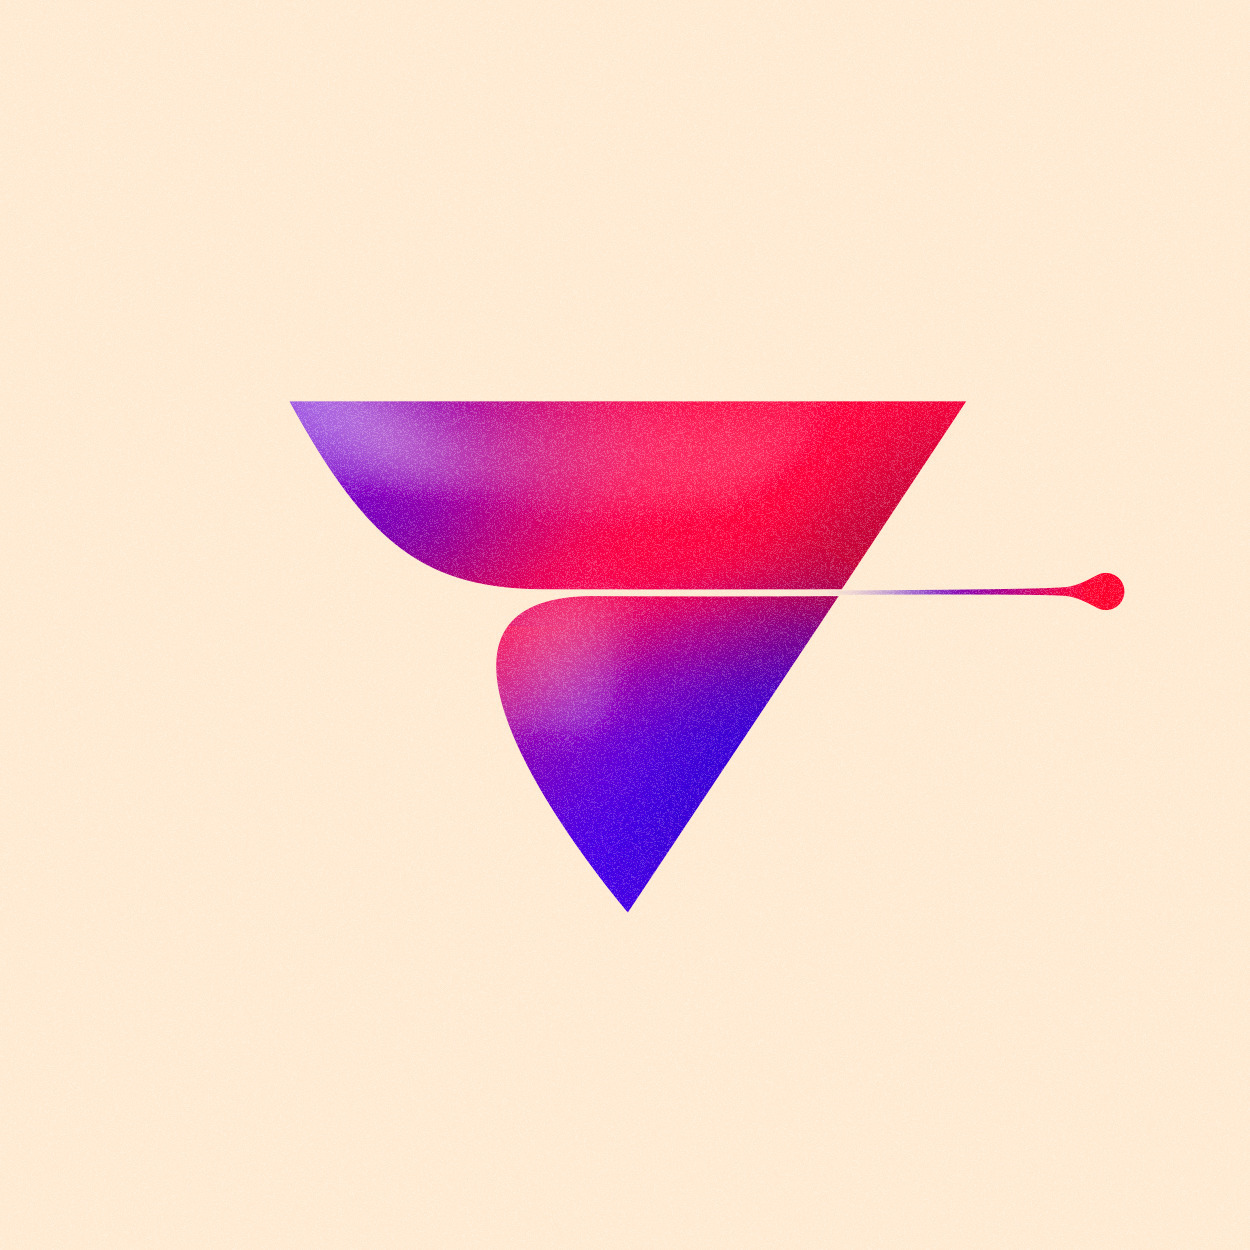 36 Days Type - 7 - art, typography - game4d | ello